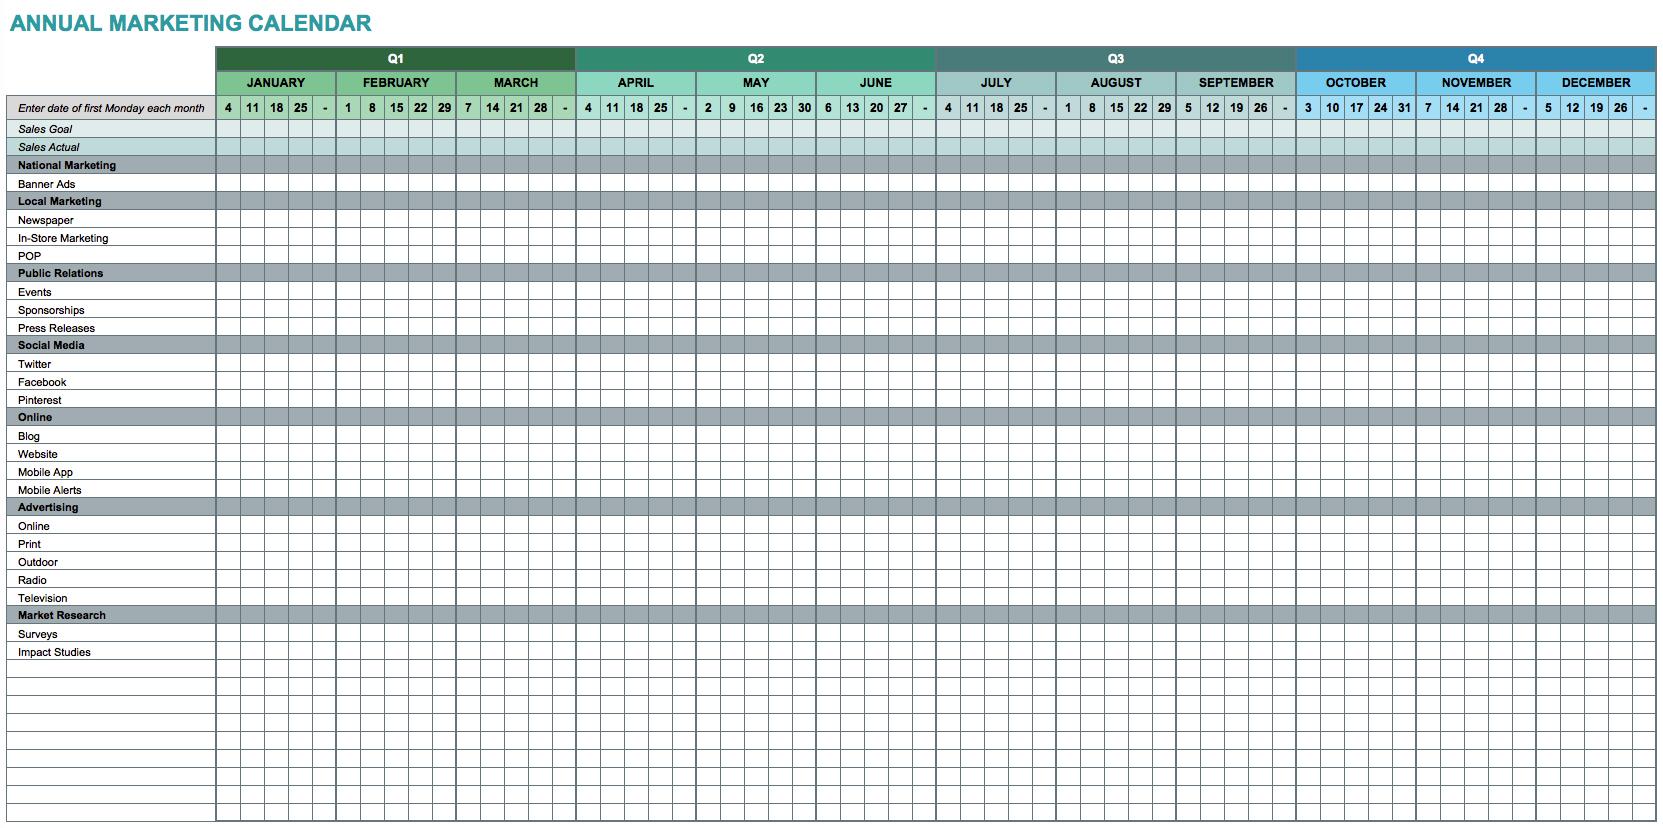 9 Free Marketing Calendar Templates For Excel - Smartsheet Within Marketing Calendar Template Free